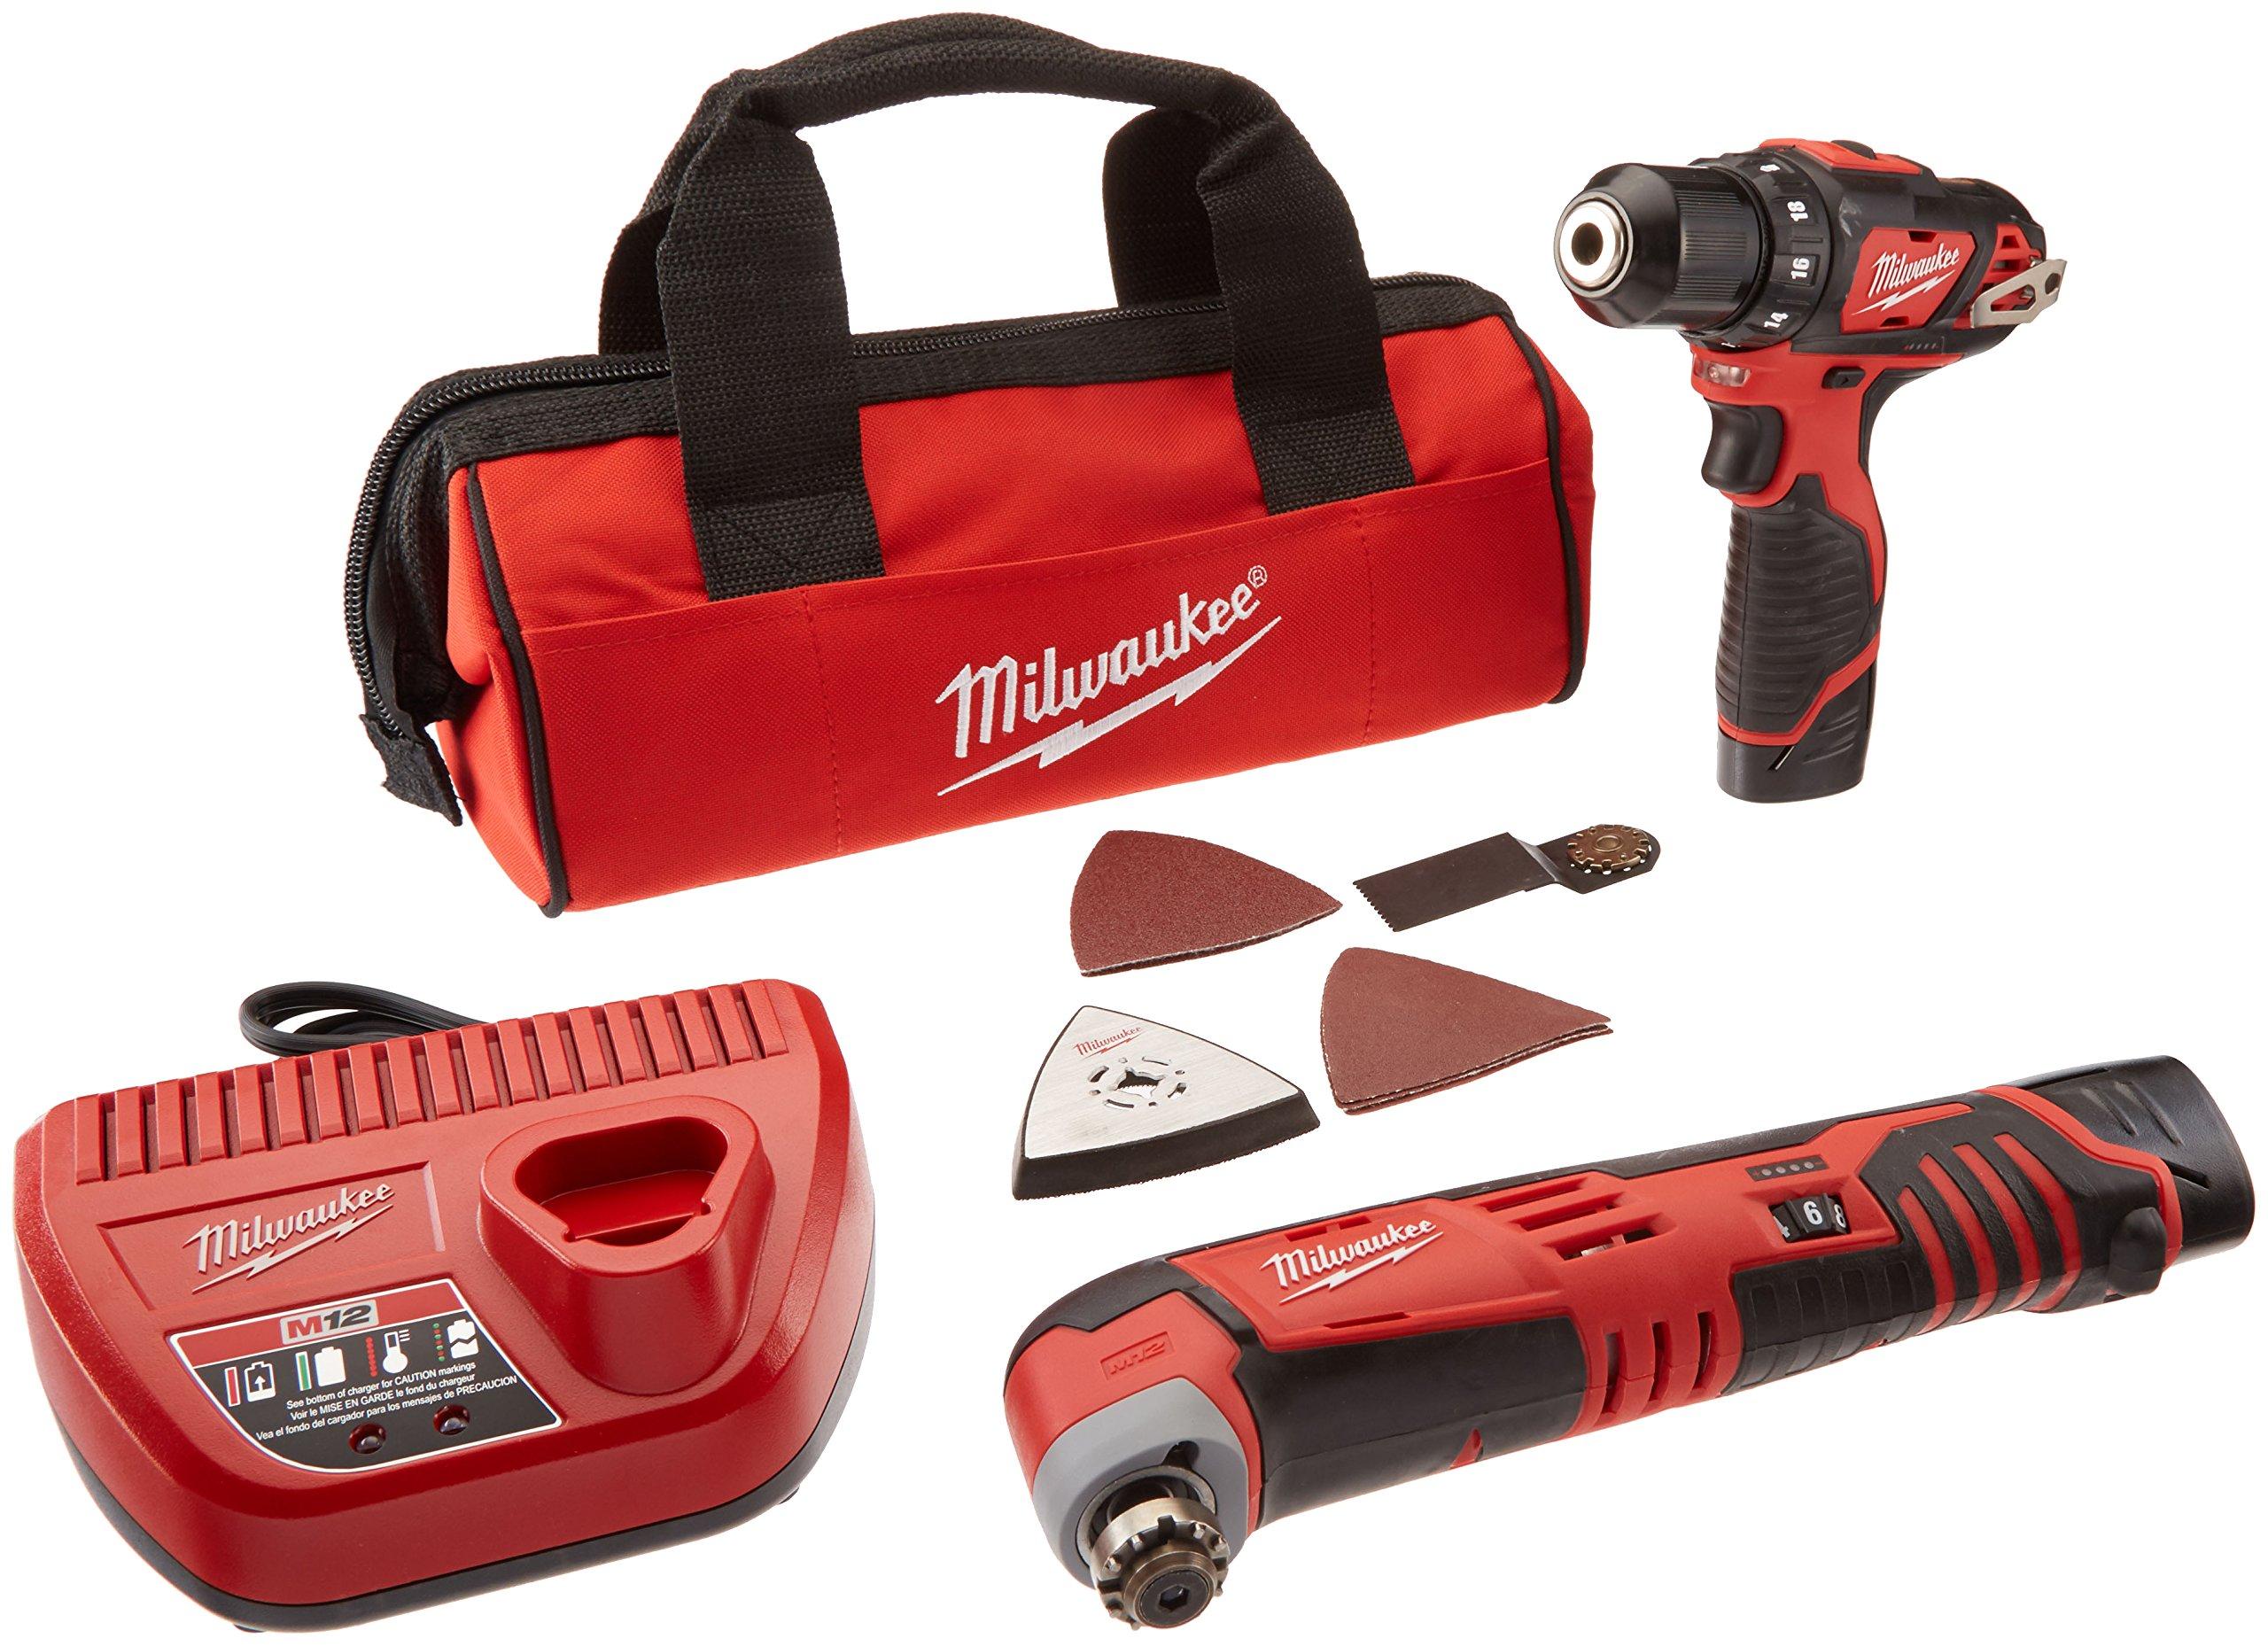 Milwaukee 2495 22 Combo Drvdrl Multi tool